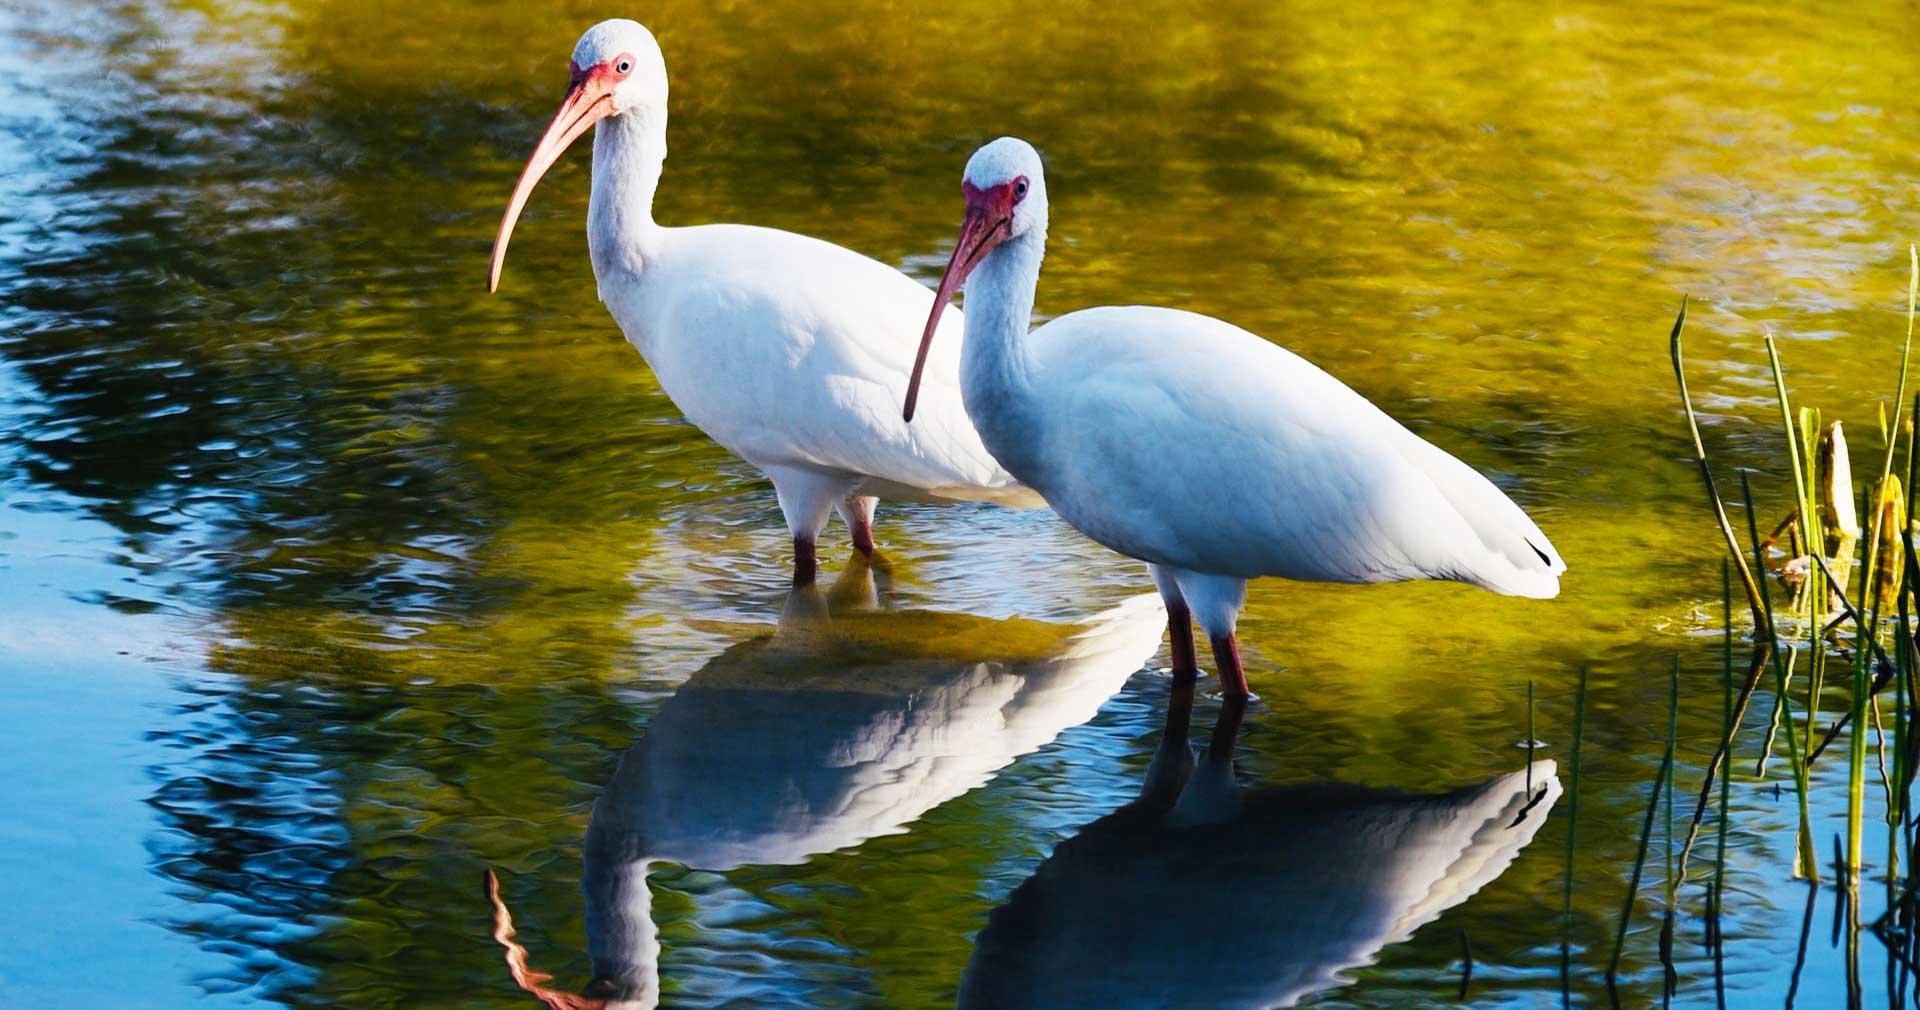 Two white ibises wading in a lake.